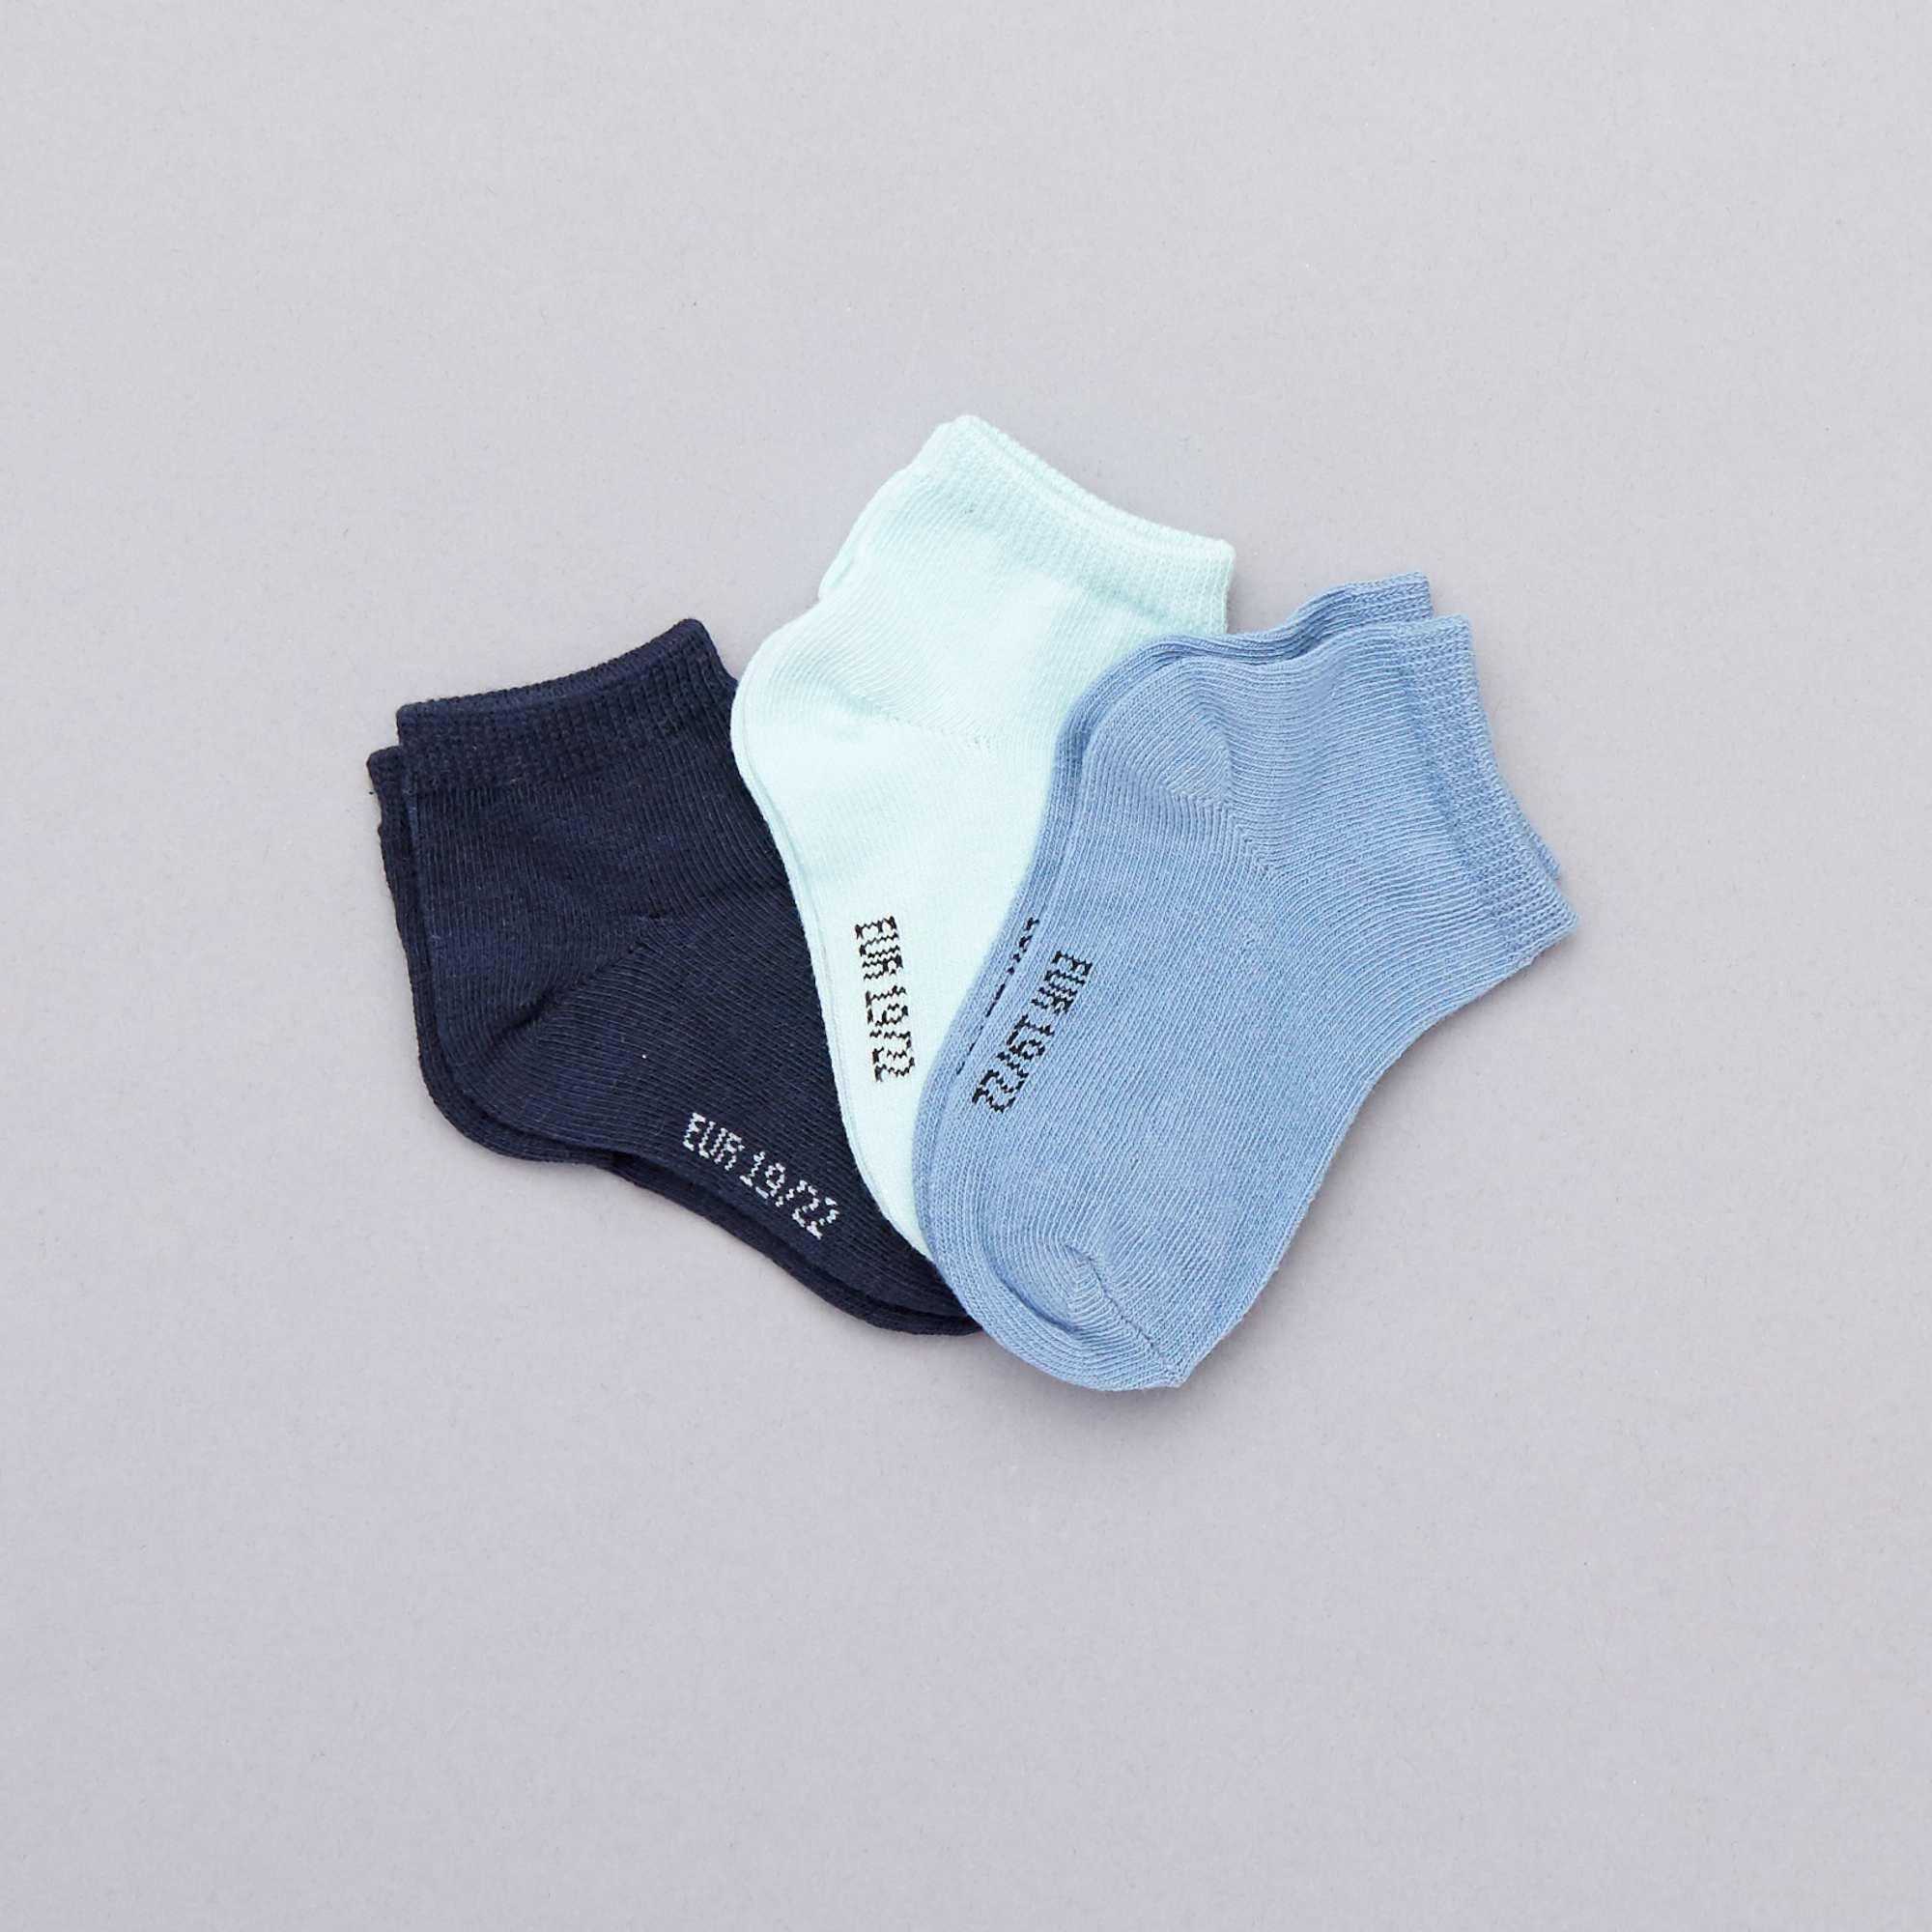 f6bcf4274 Pack de 3 pares calcetines invisibles lisos azul Bebé niño. Loading zoom